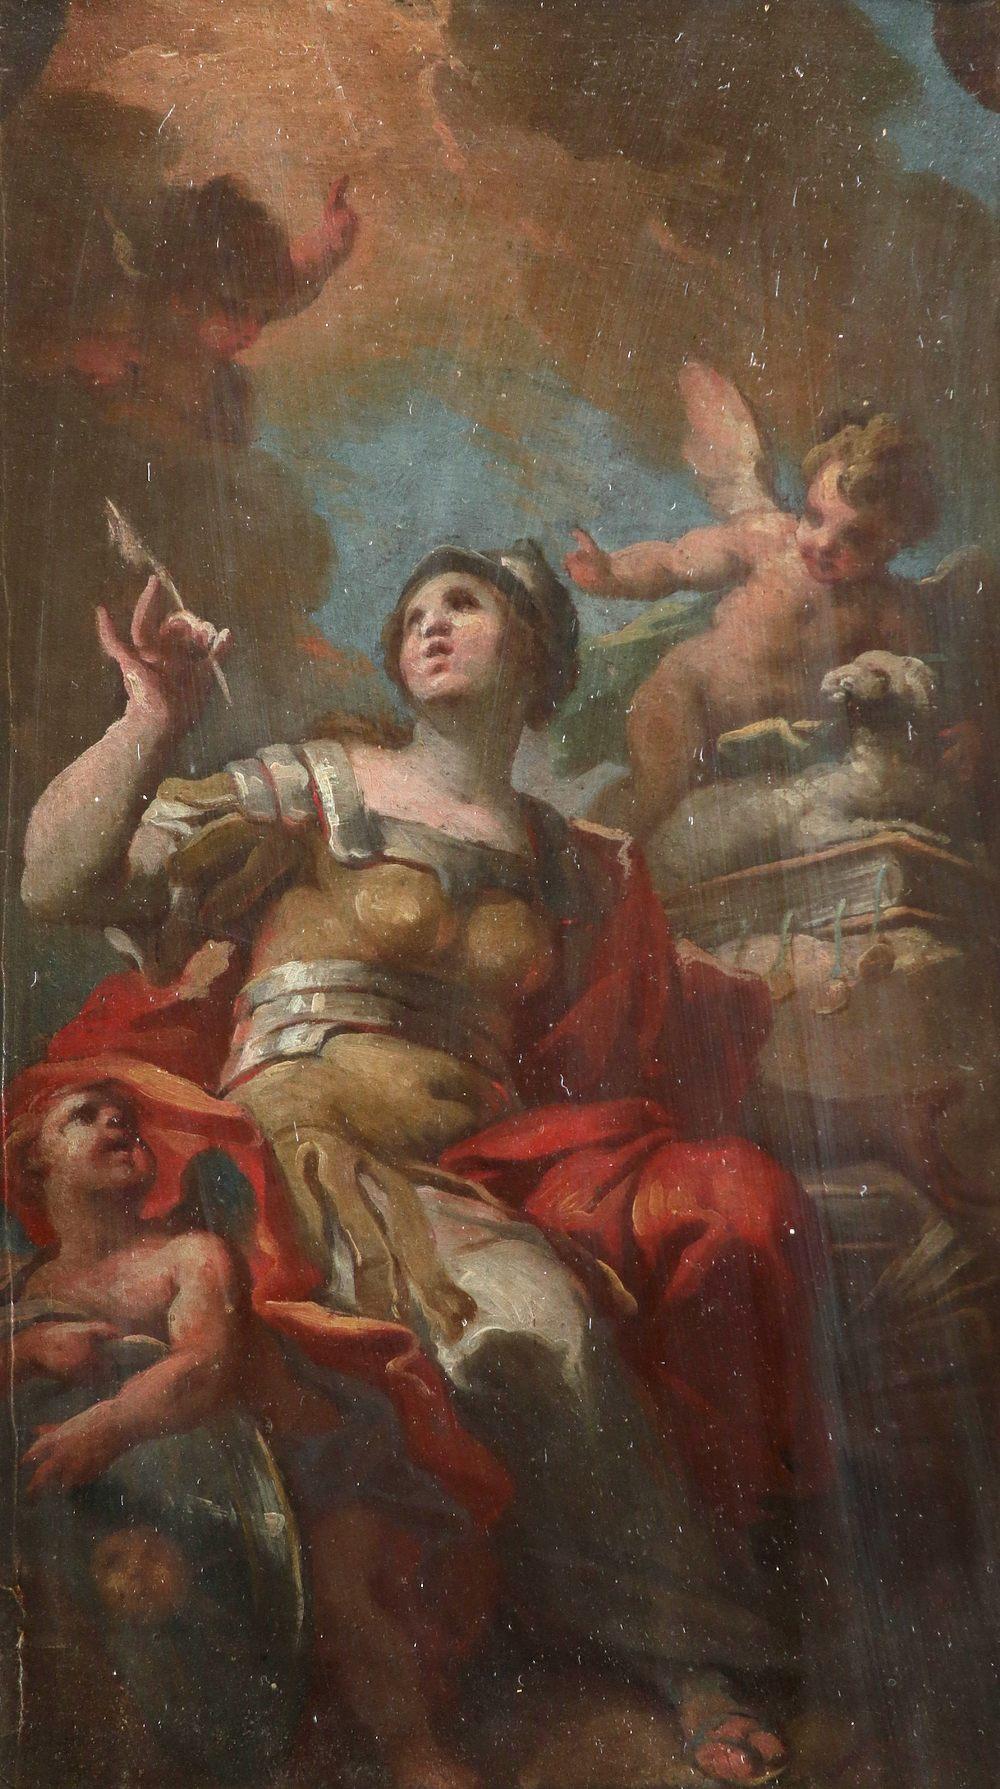 Corrado Giaquinto (Italian 1703-1766) Allegory of Divine Wisdom (Divina Sapienza) Oil on paper